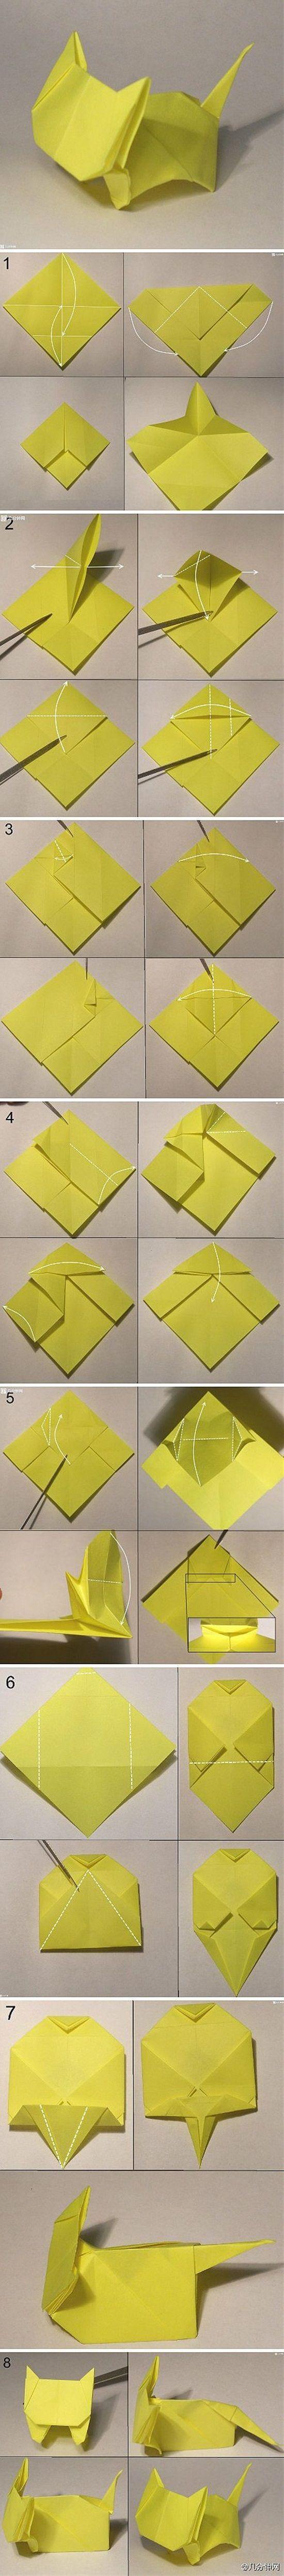 15 Easy Origami Tutorials For Anyone To Follow | Postris